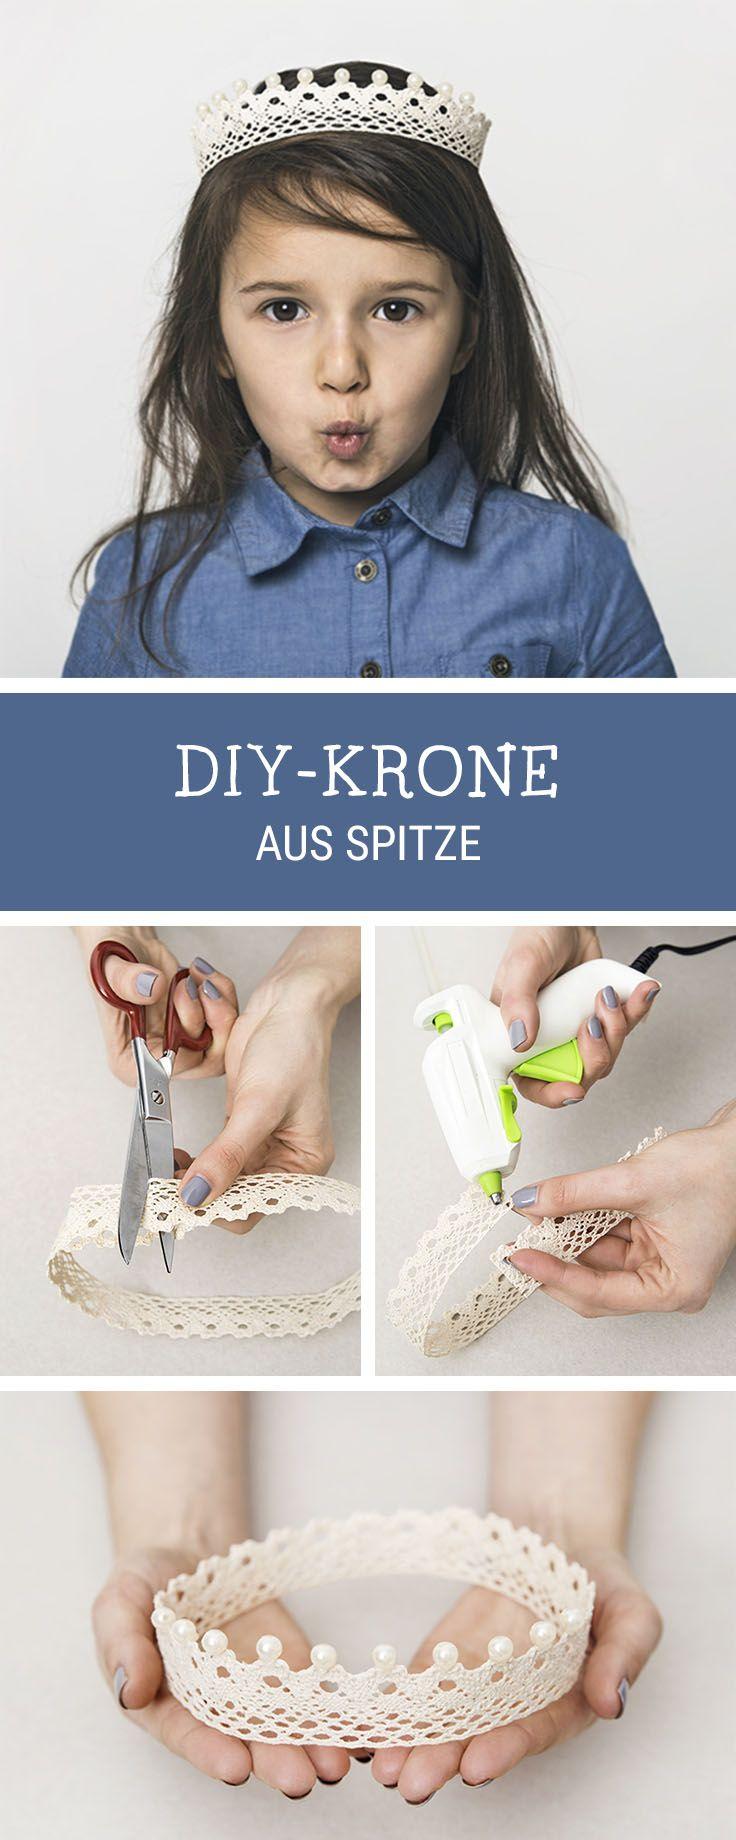 Einfache DIY-Idee für Fasching und Karneval: Krone aus Spitze selbermachen / easy diy tutorial for carnival: princess crown made of laces via DaWanda.com